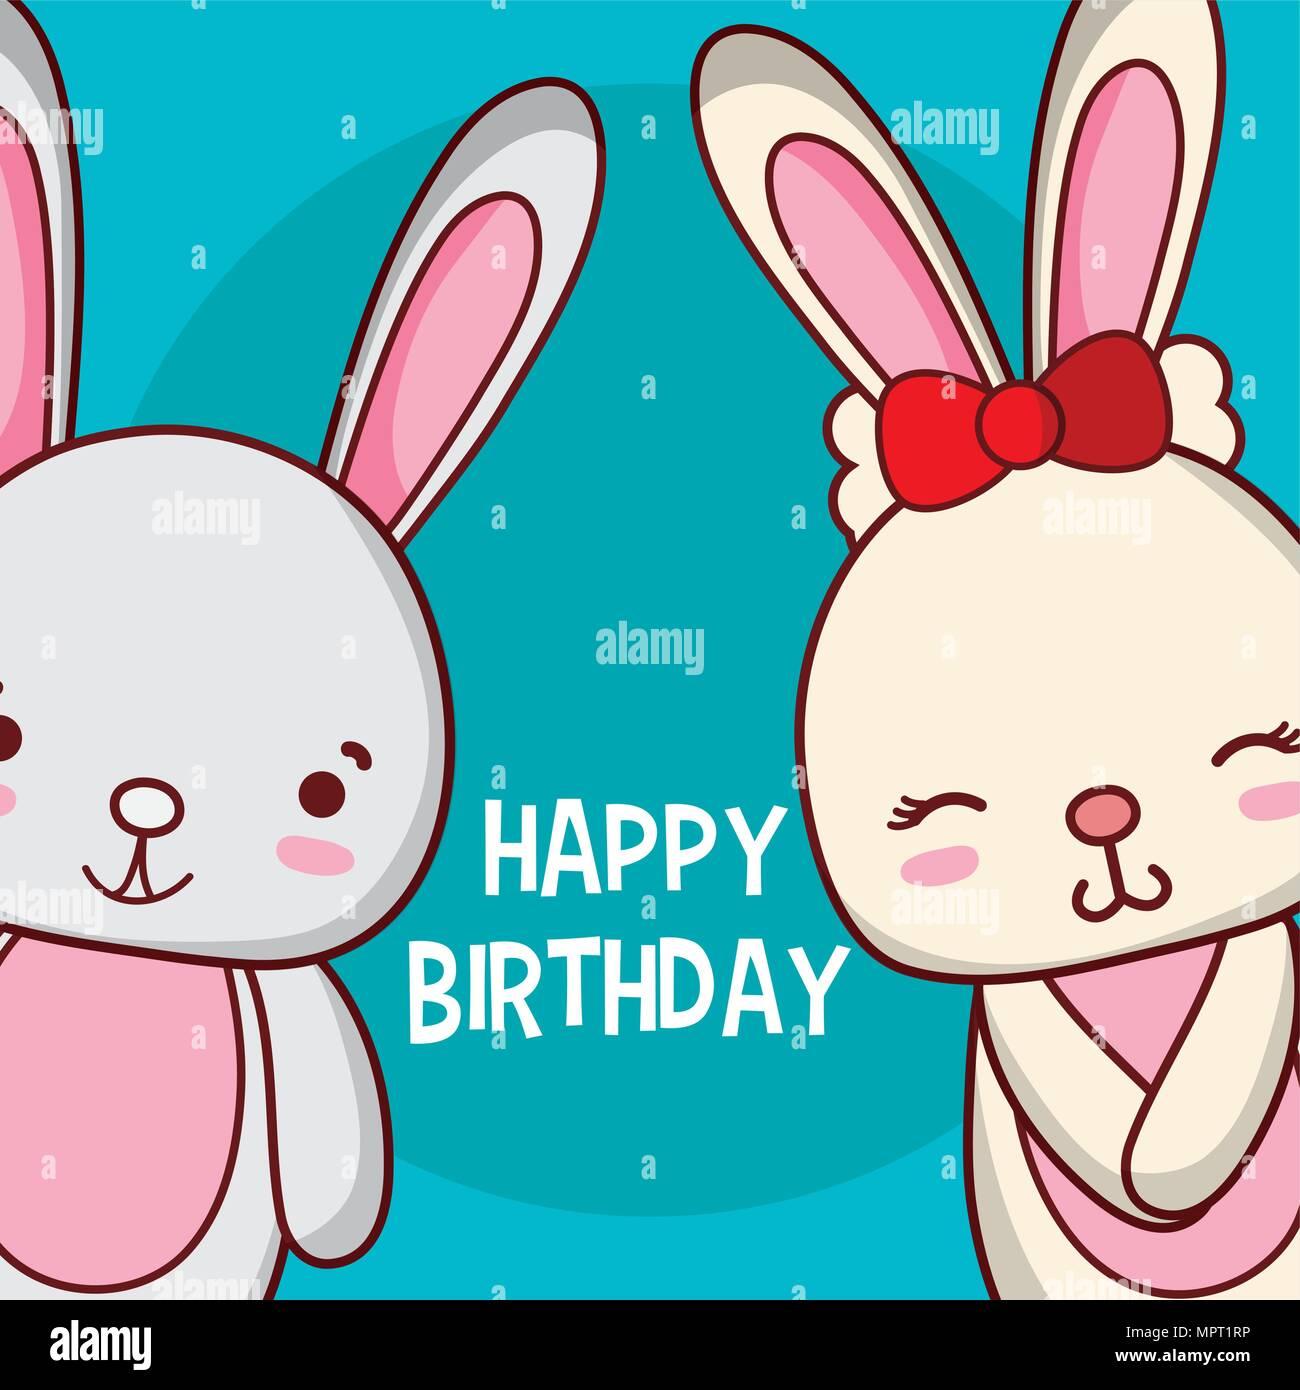 Cute Rabbits Happy Birthday Card